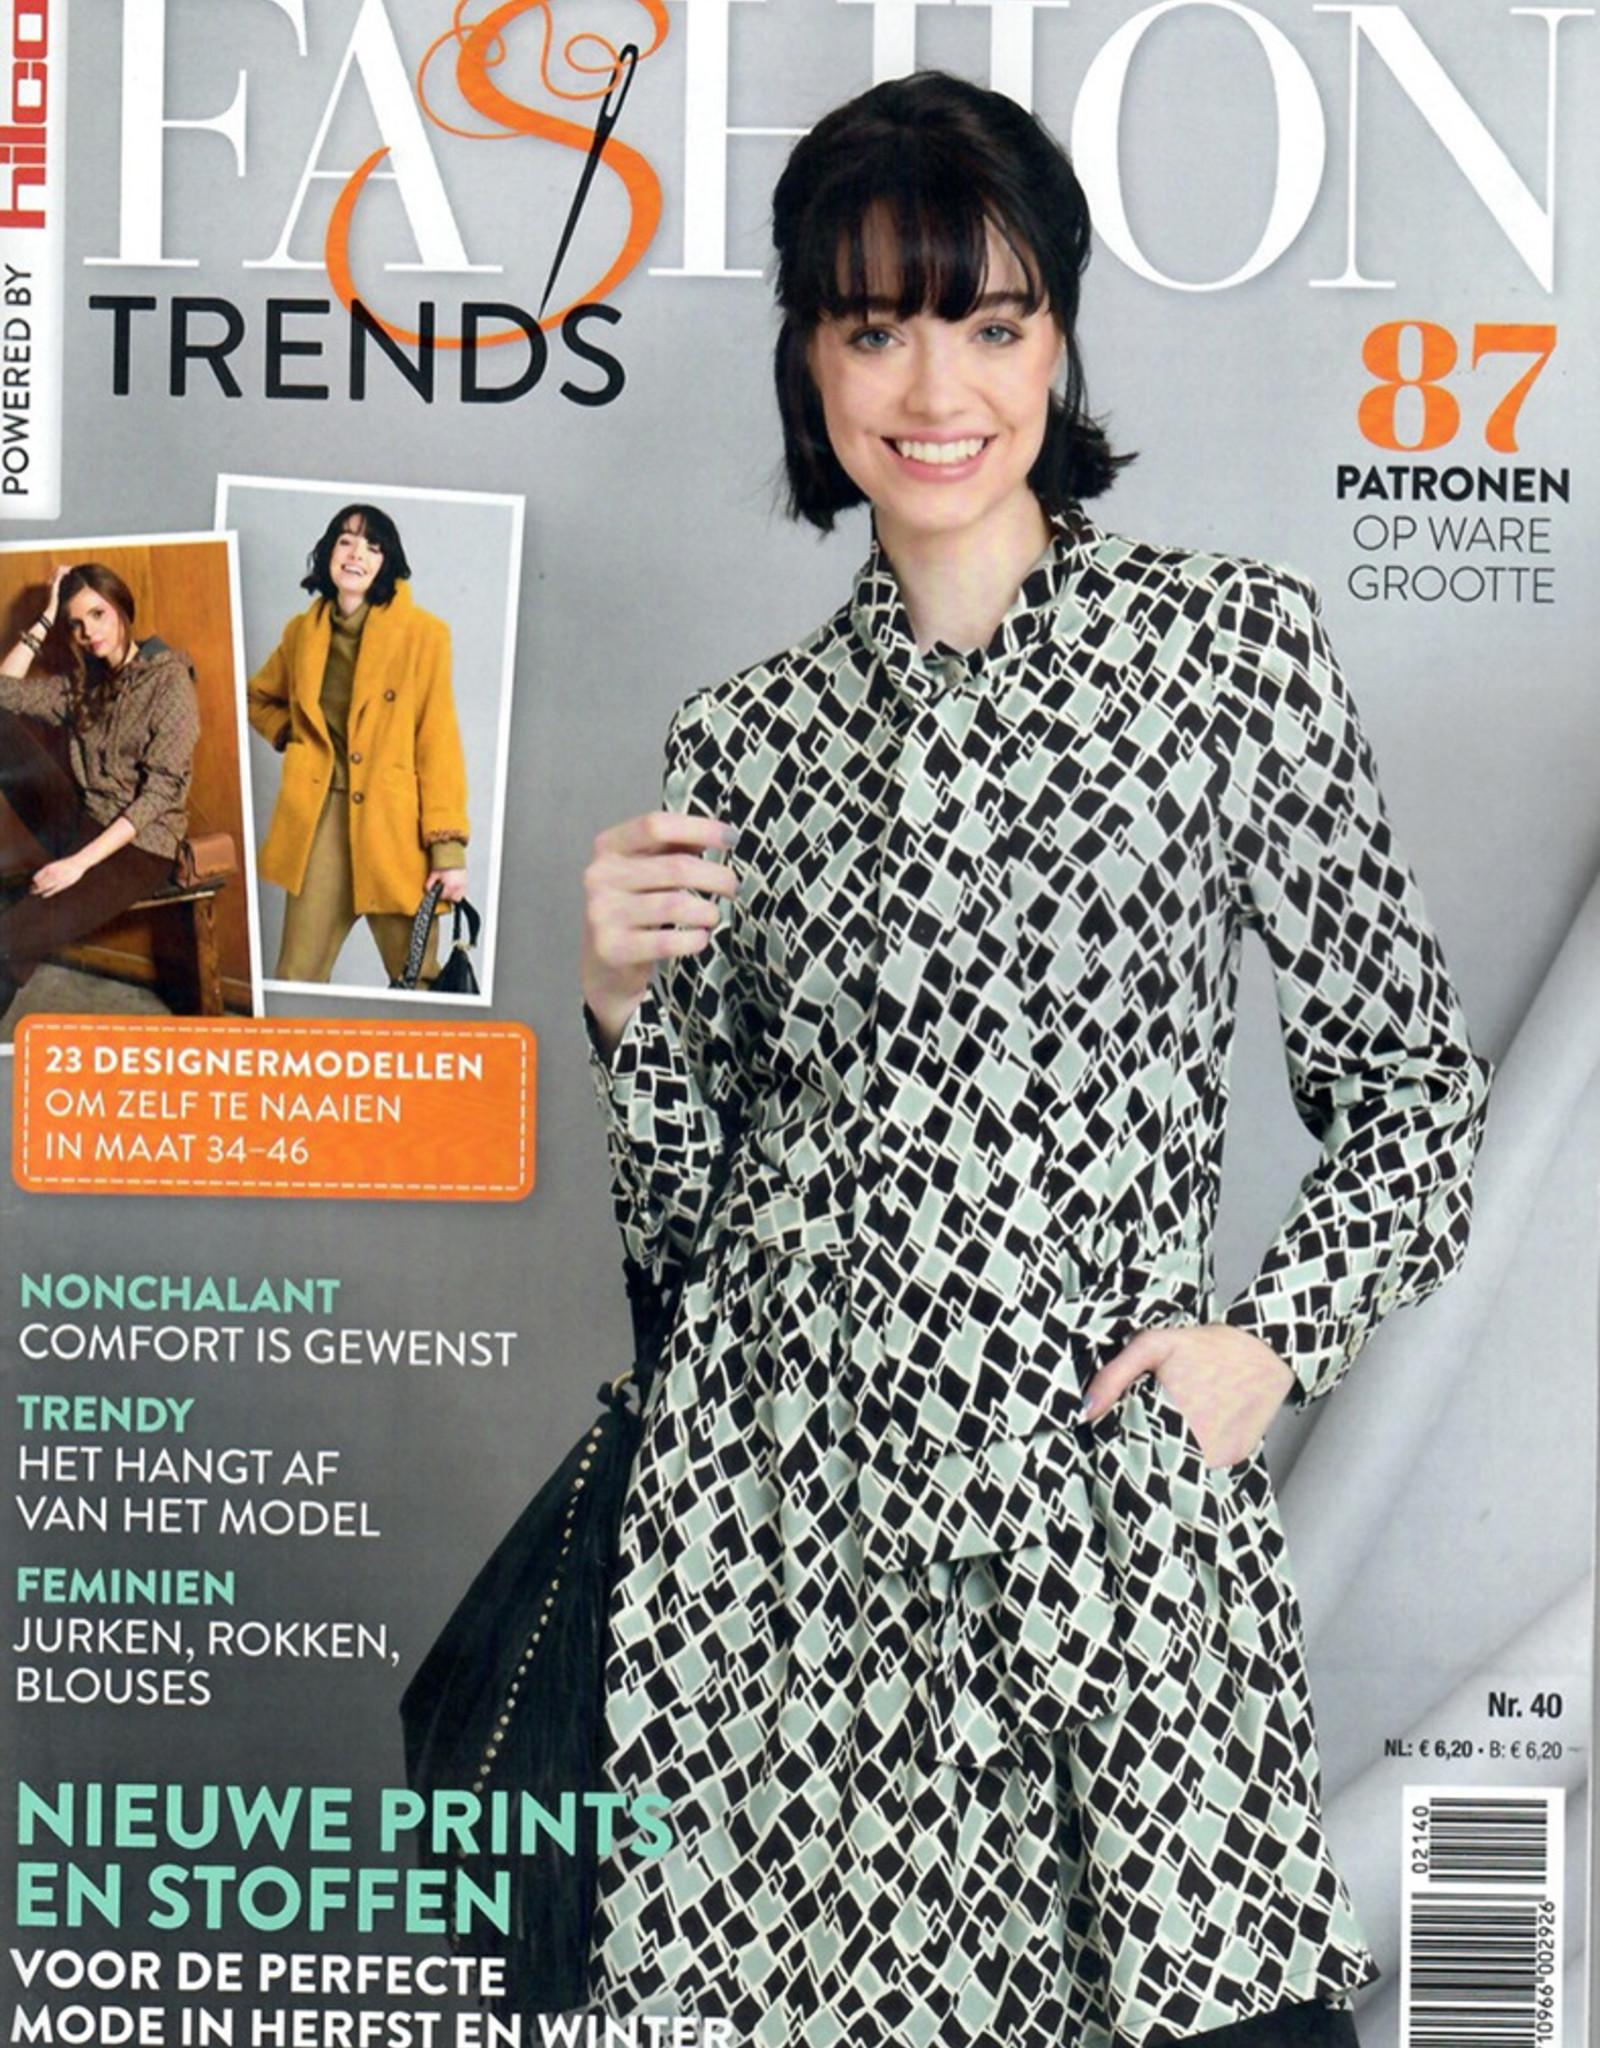 Hilco Fashion Trends by Hilco nr 39 herfst/winter 2021 - naaimagazine